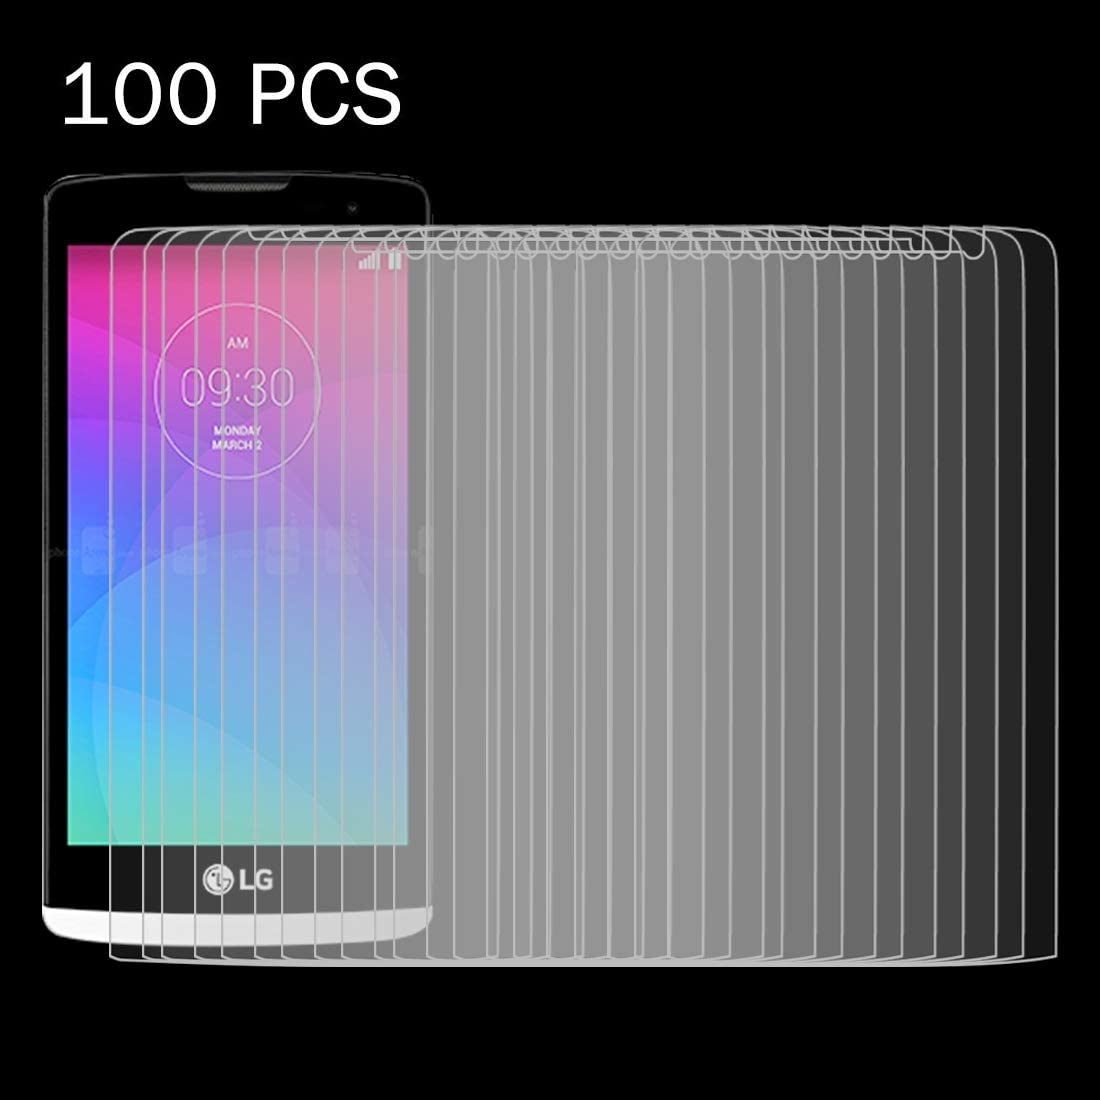 C40 0.26mm 9H Surface Hardness 2.5D Explosion-Proof Tempered Glass Film Tempered Glass Film Screen Protector Film 100 PCS for LG Leon